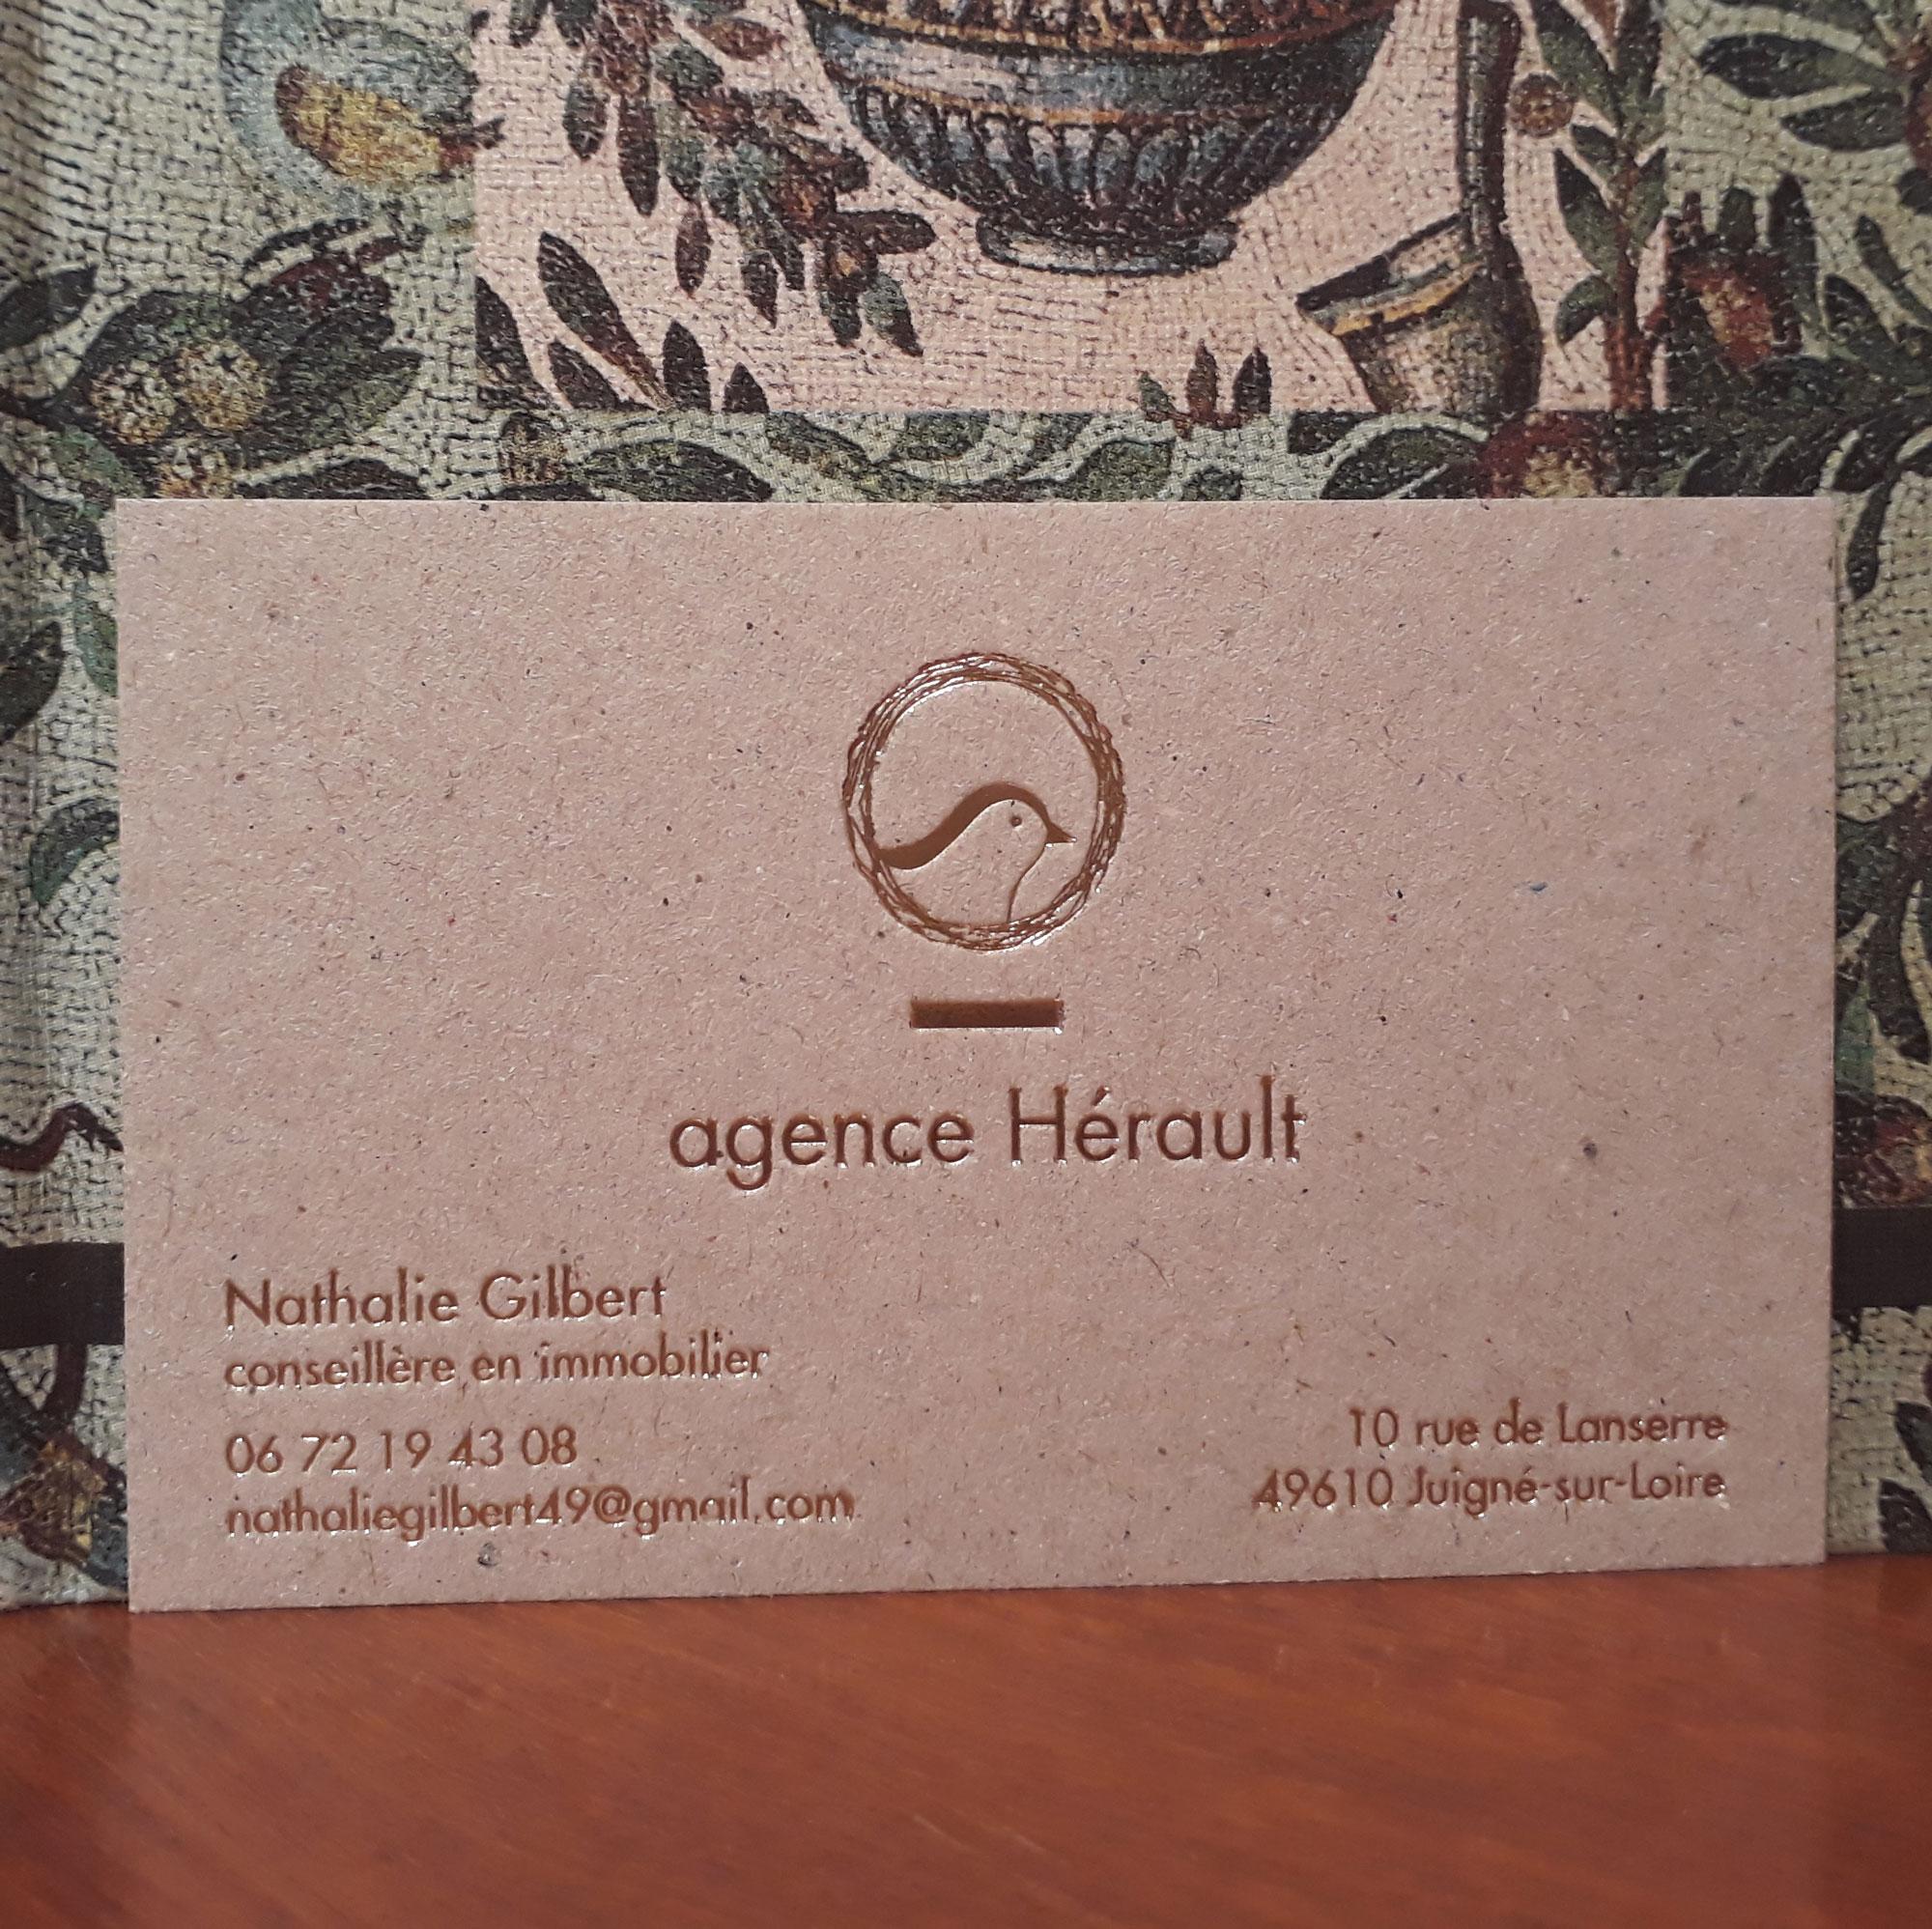 hortense-rossignol-graphiste-angers-carte-de-visite-marquage-a-chaud-or-carton-gris